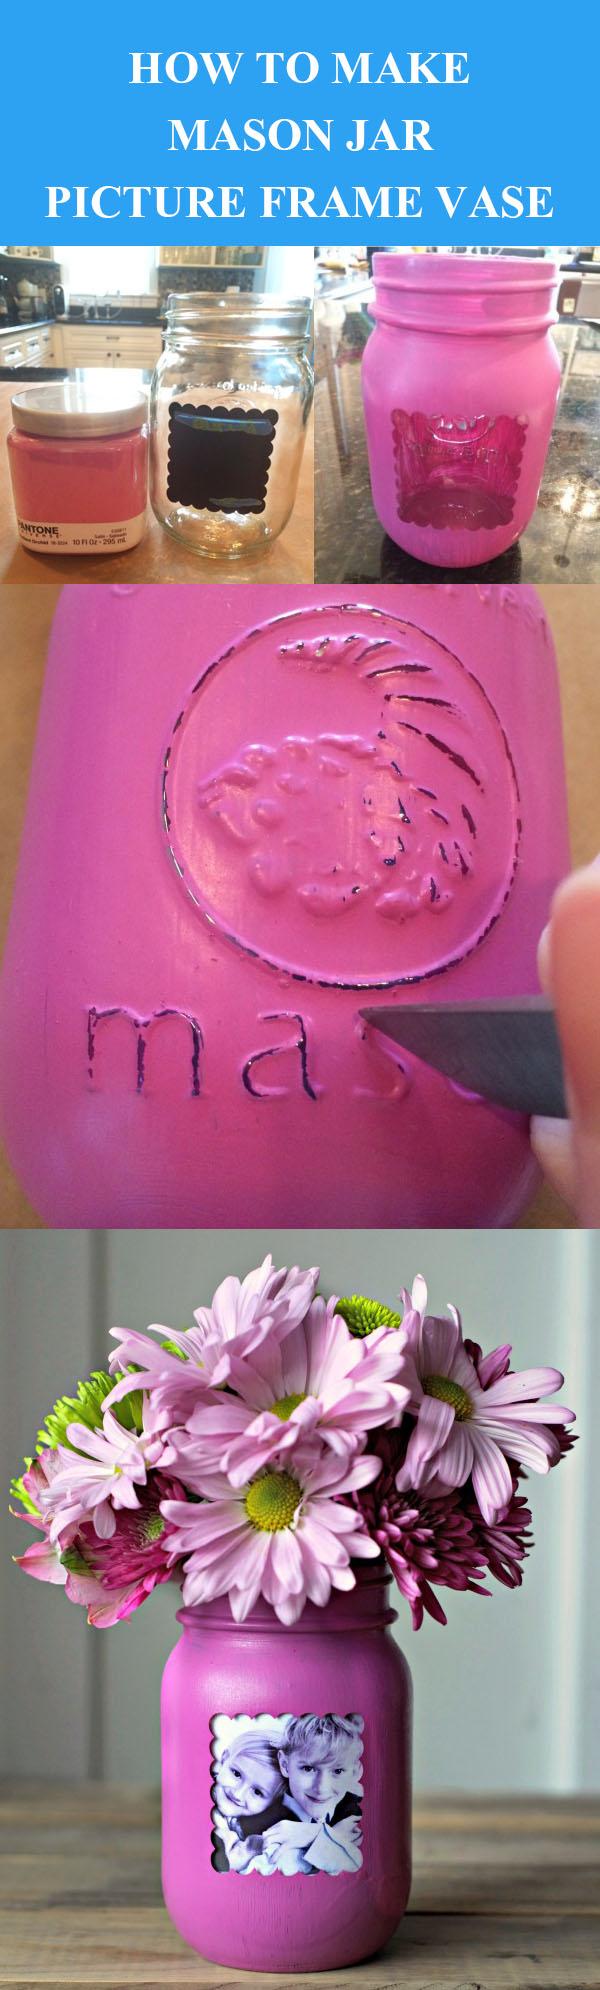 DIY Mason Jar Picture Frame Vase